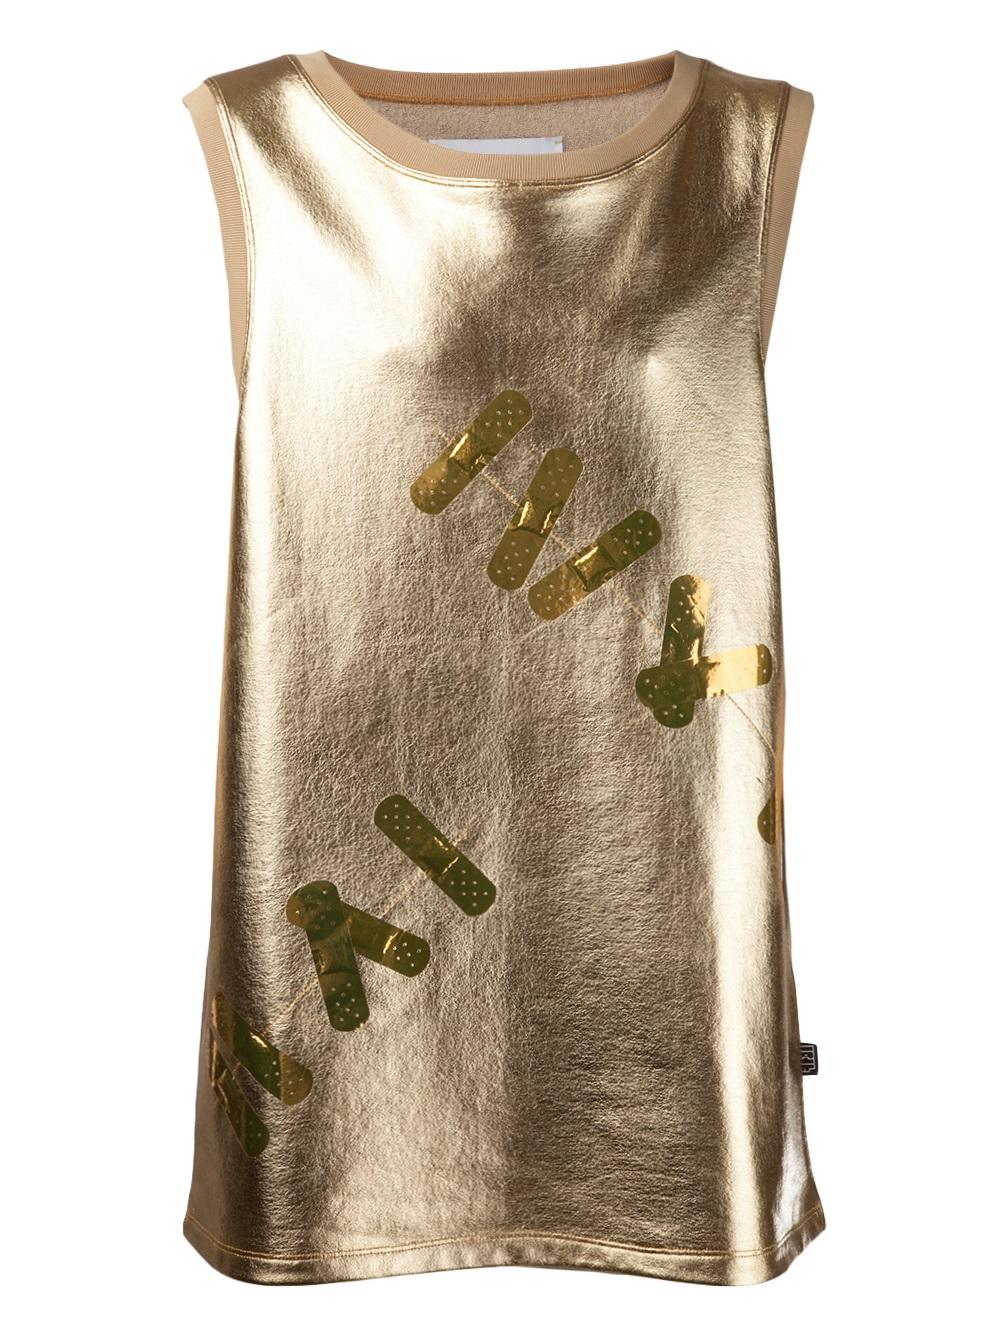 Lyst Kye Sleeveless Metallic Tank Top In Metallic For Men